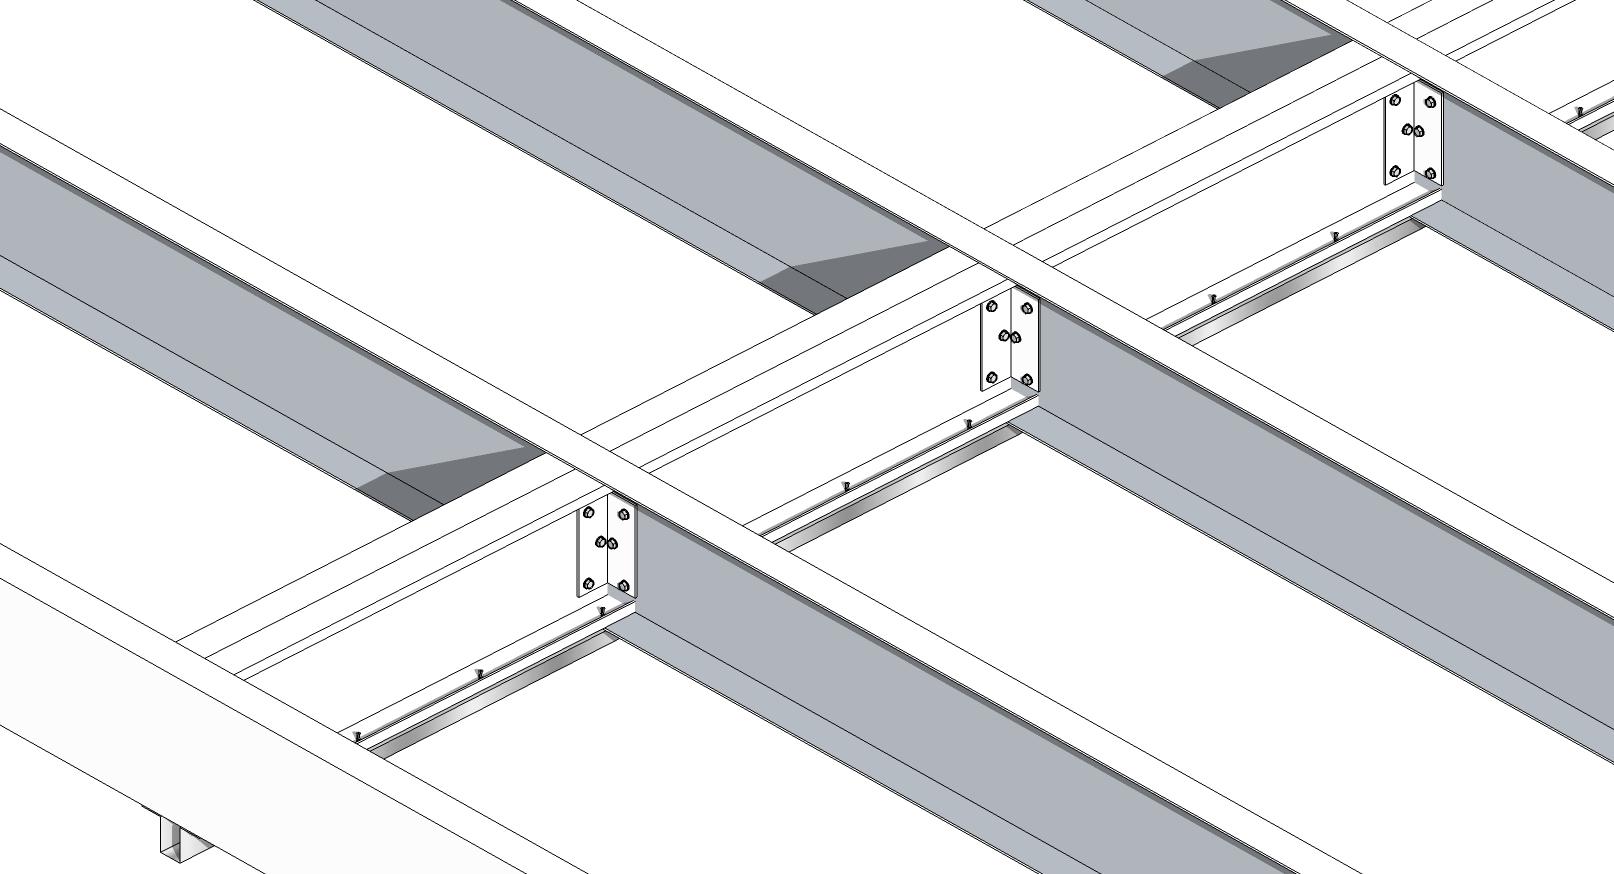 Analisis steel framing galvanalisis - Perfiles de chapa ...